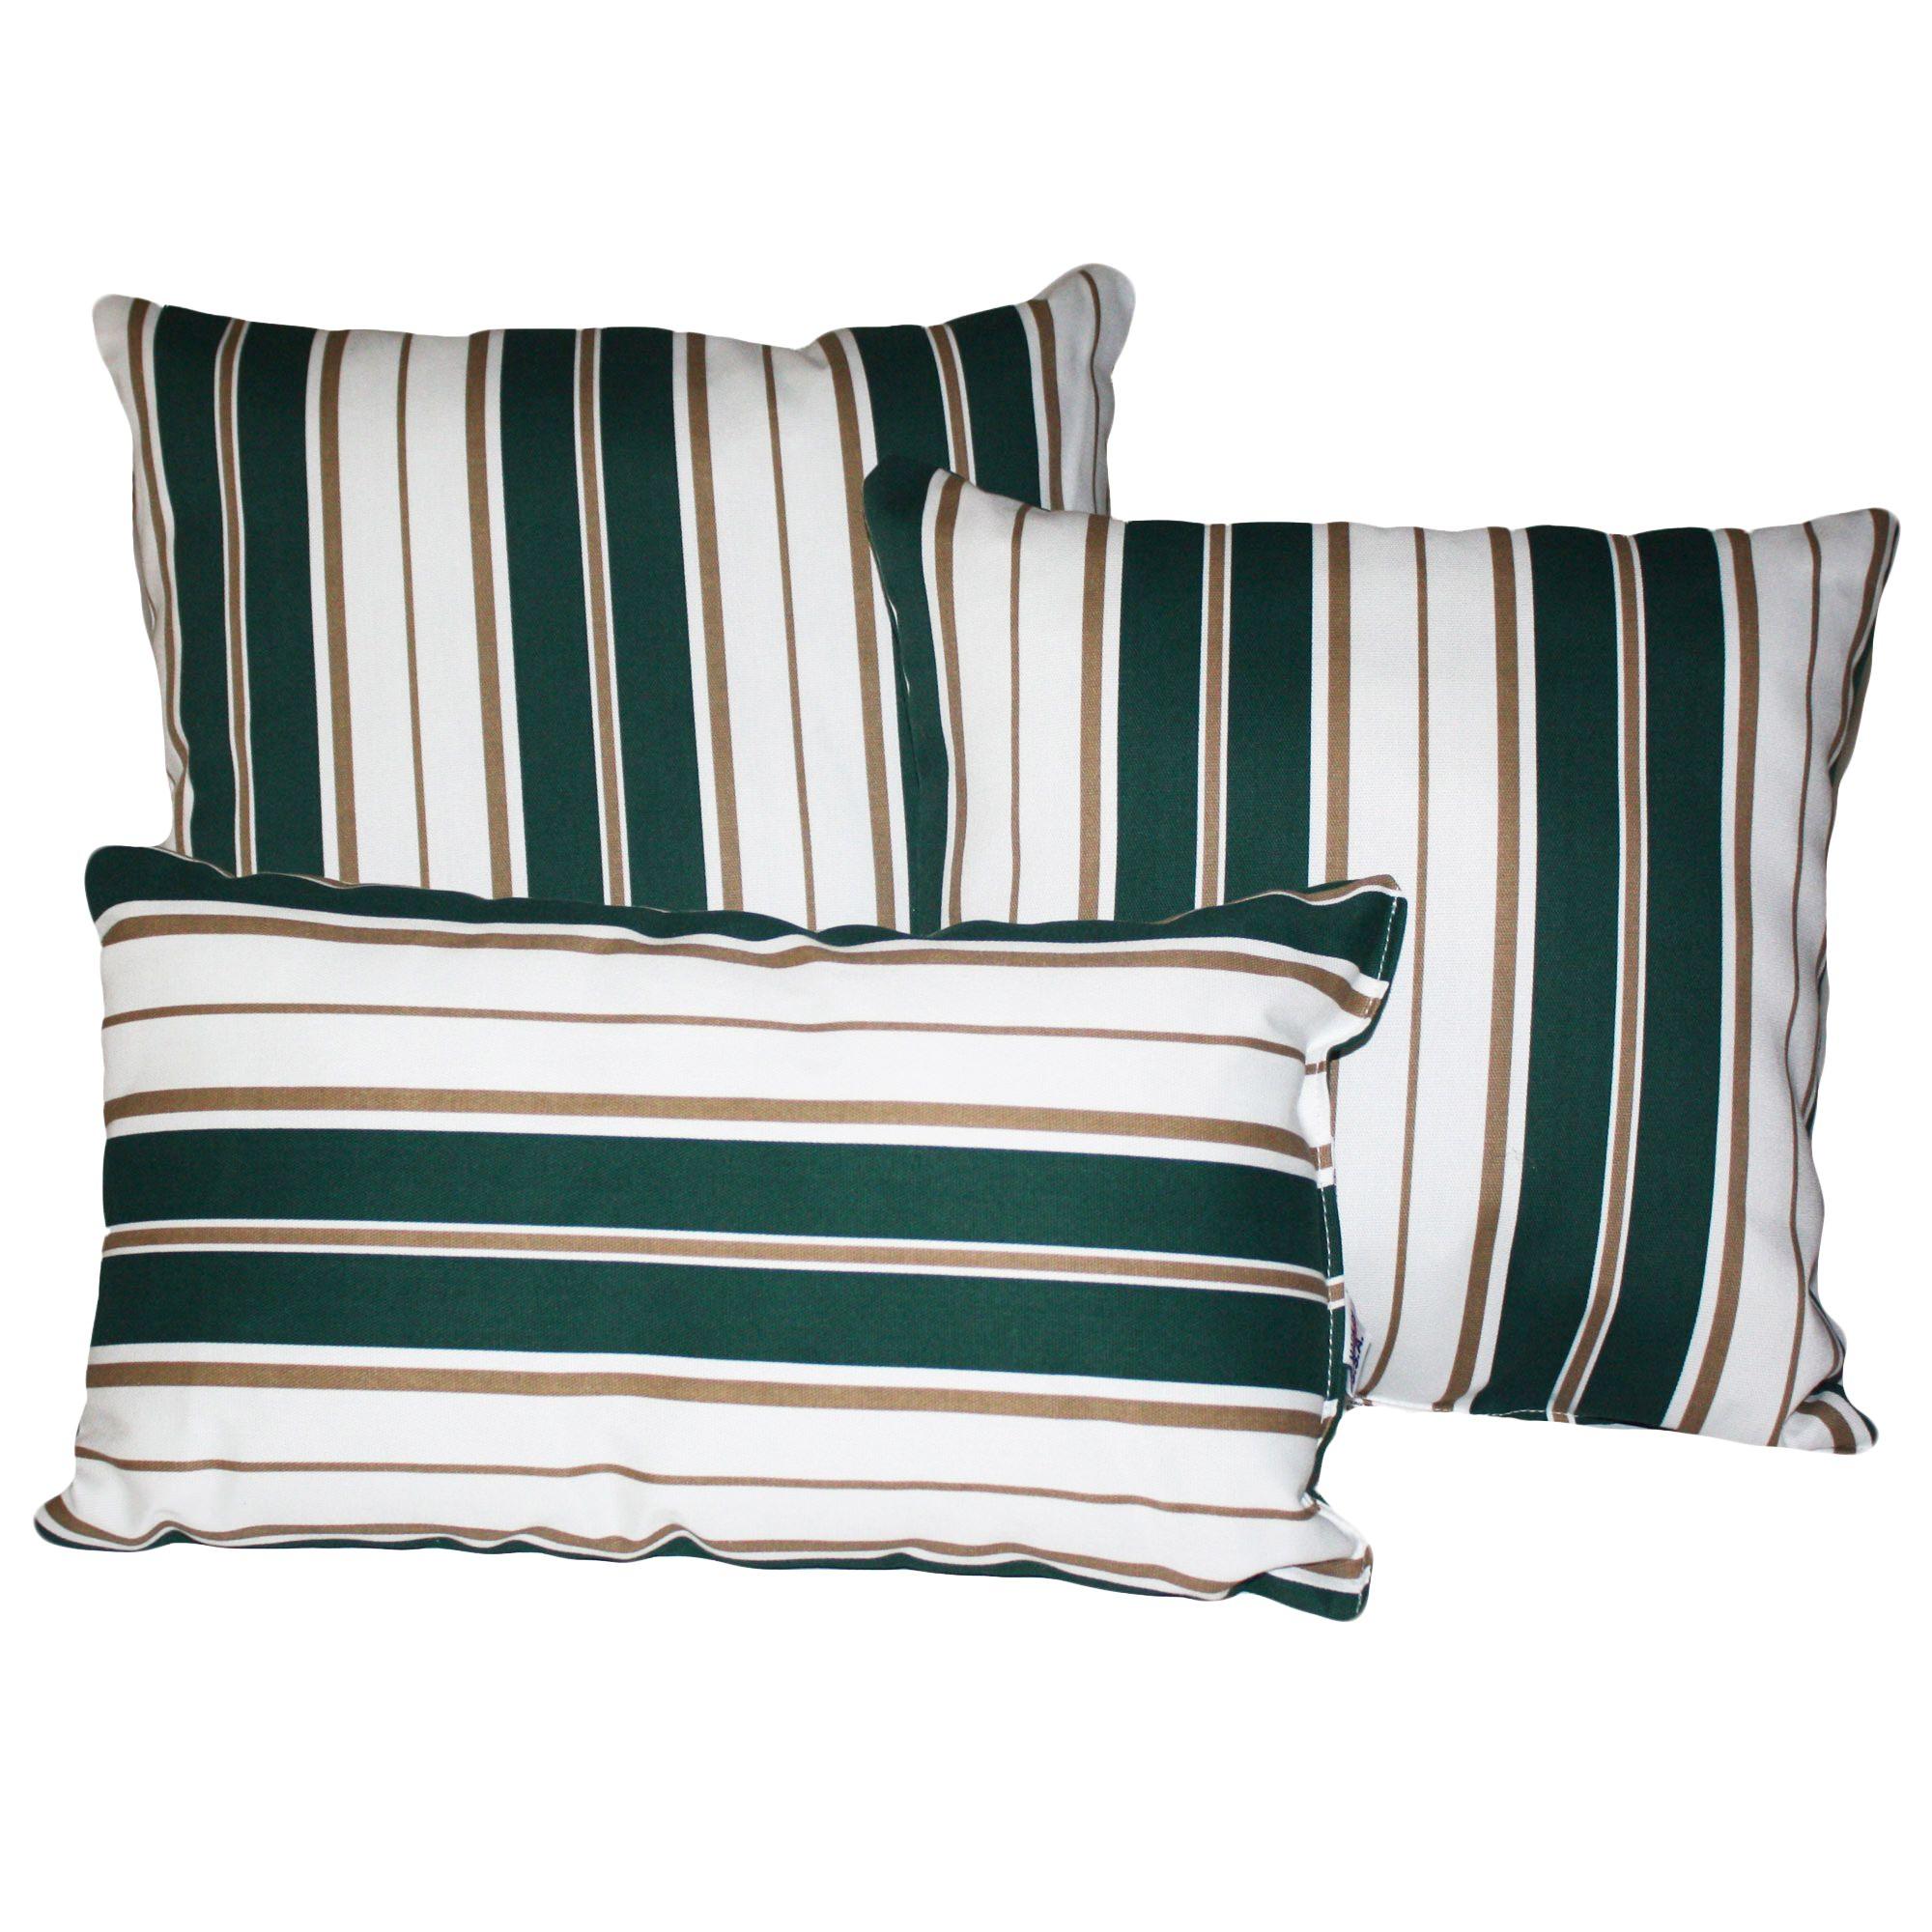 Green and white stripe outdoor throw pillow dfohome for Green and white throw pillows